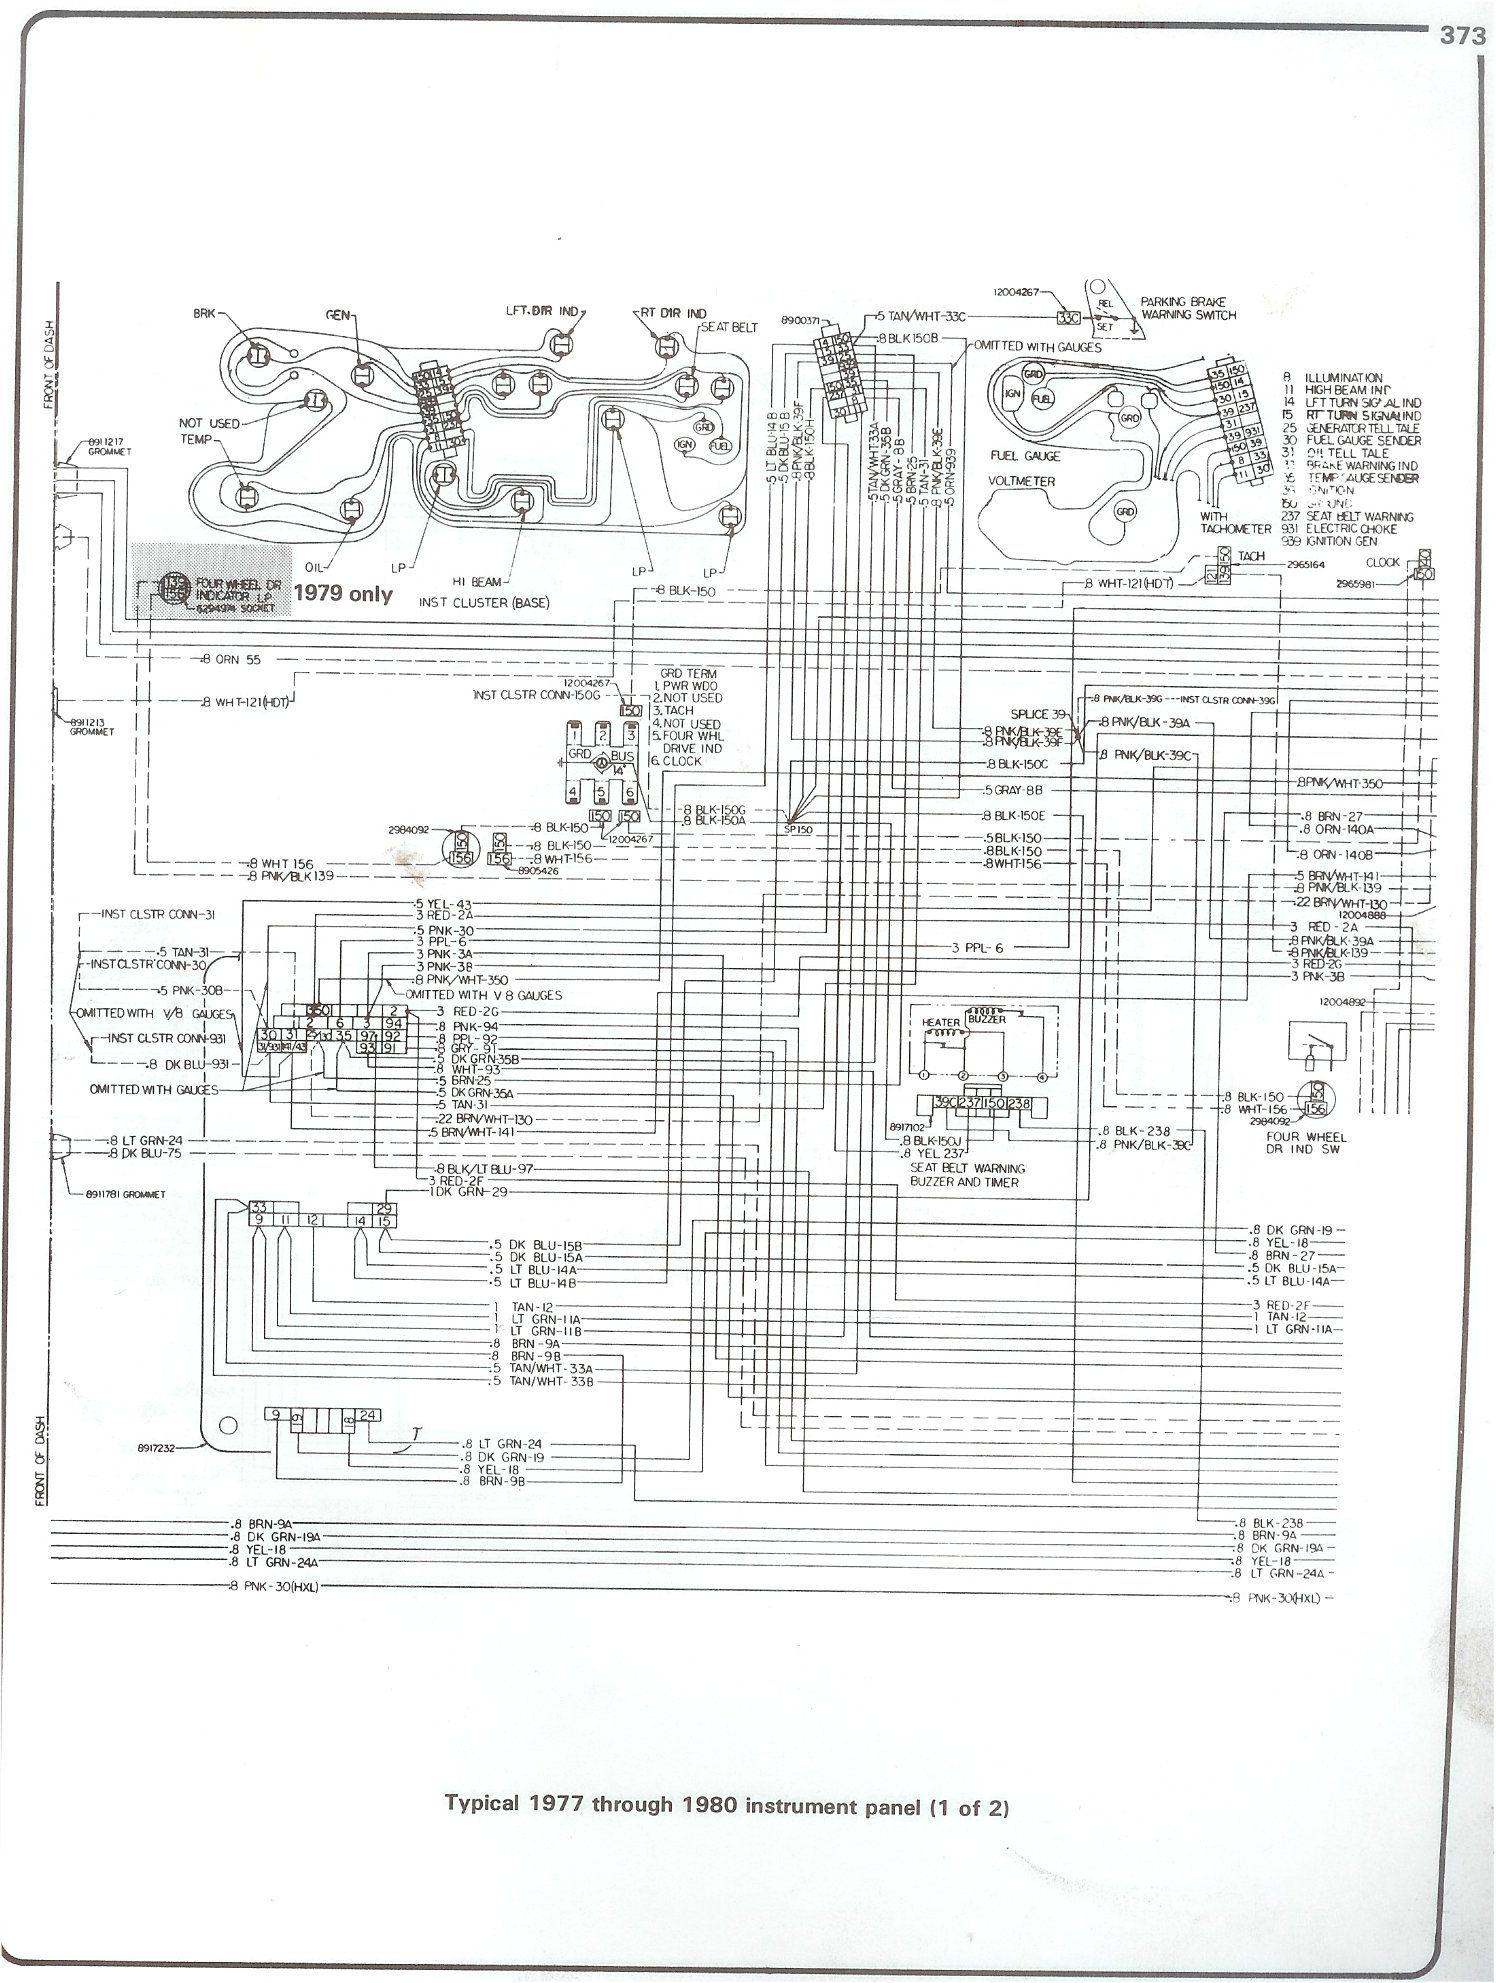 Pin De Klever Sanchez En Inagenes Web Manual Guide